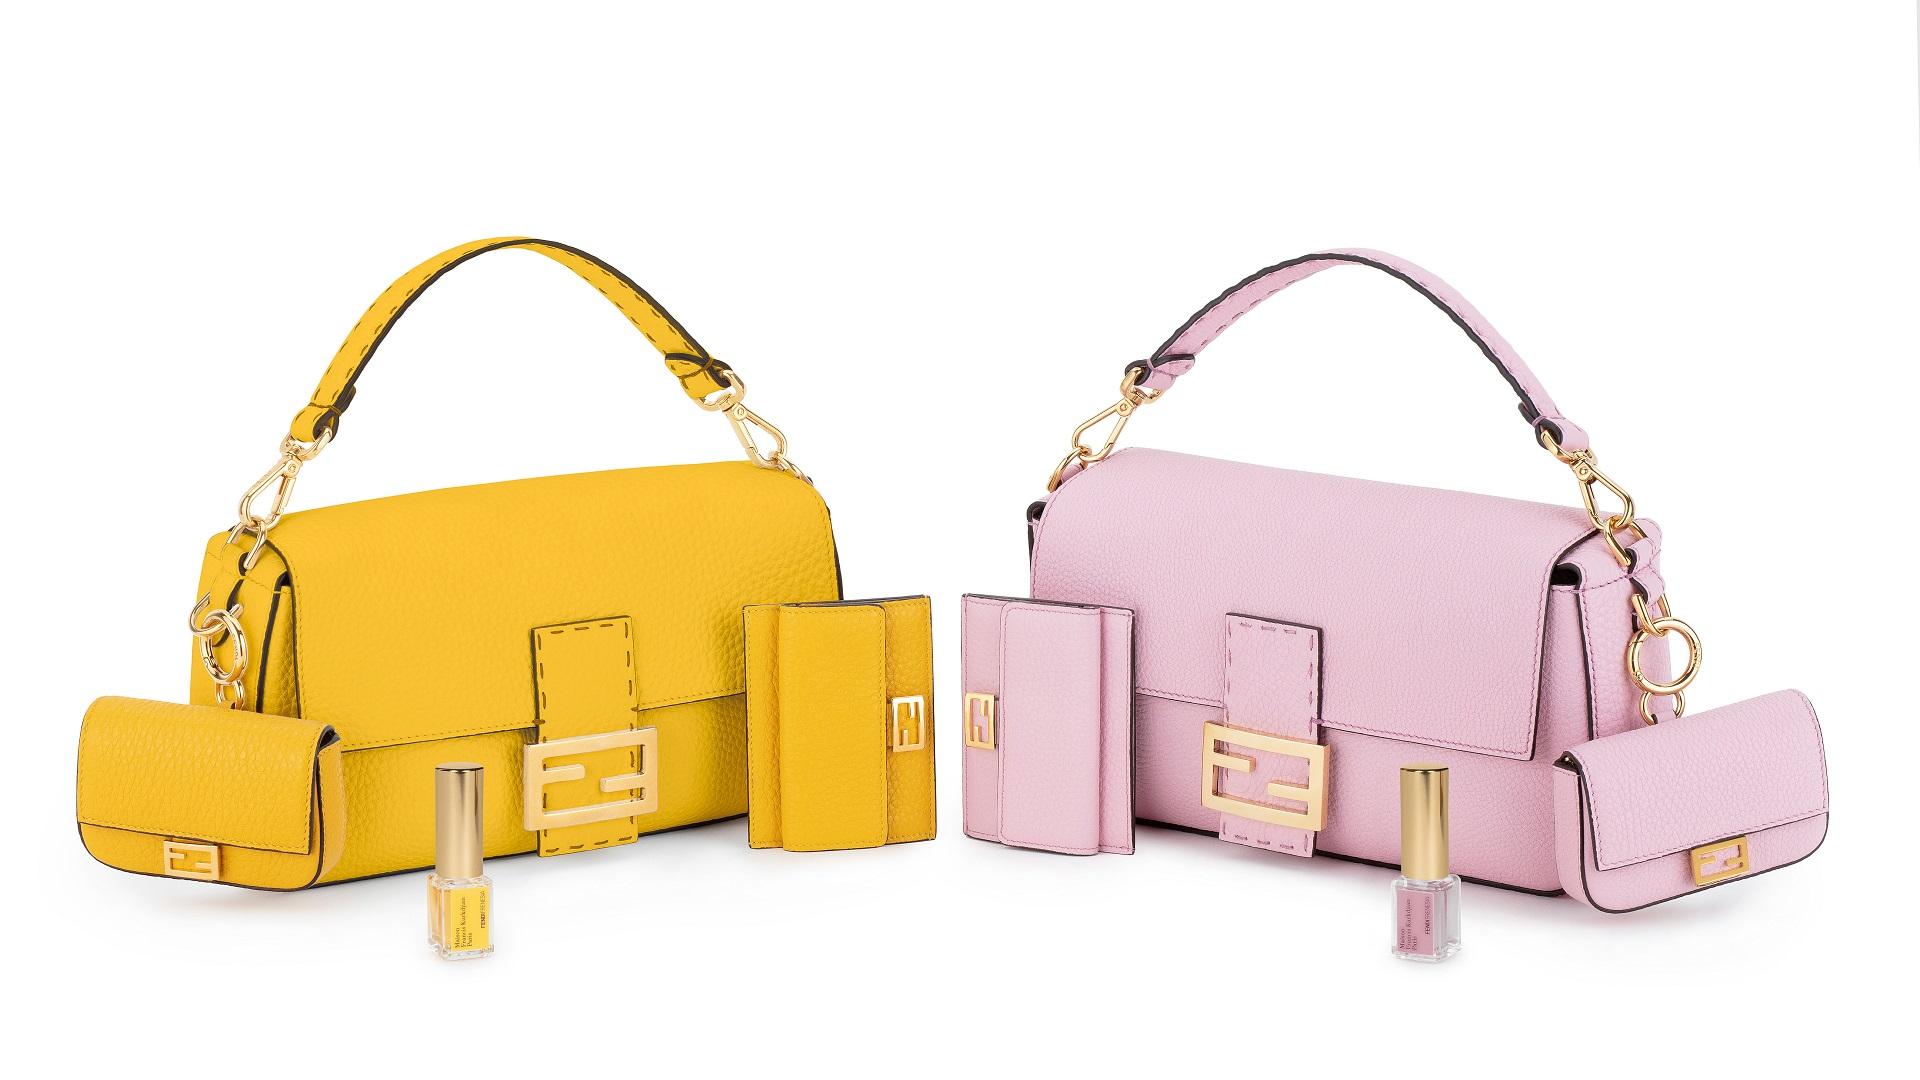 Fendi Frenesia el bolso baguette perfumado con esencia de Maison Francis Kurkdjian